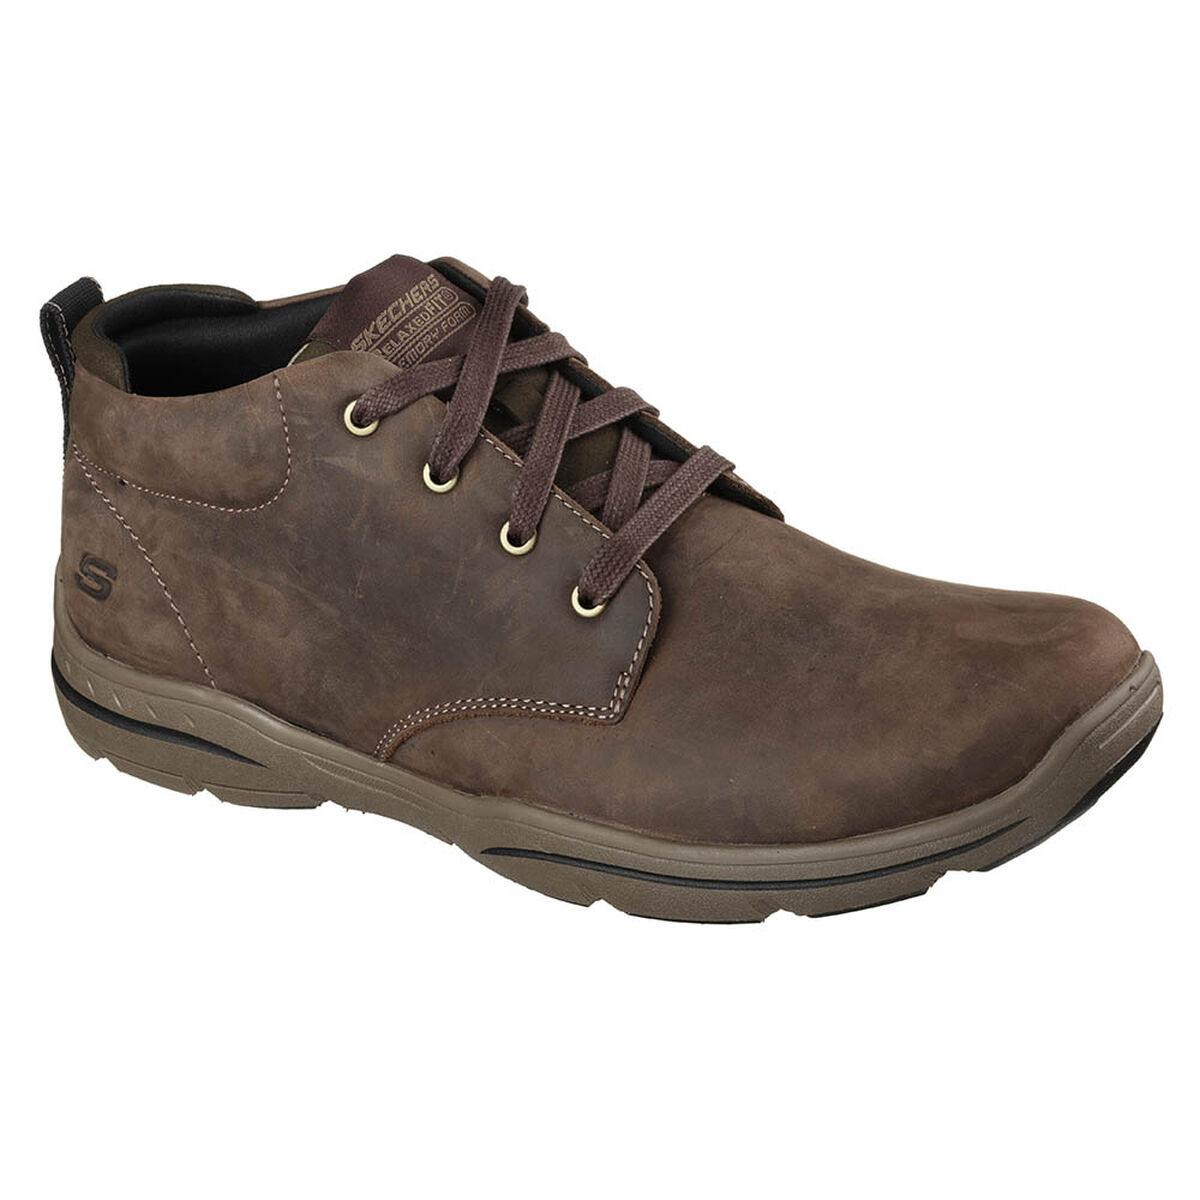 Zapato Hombre Skechers Harper- Melden